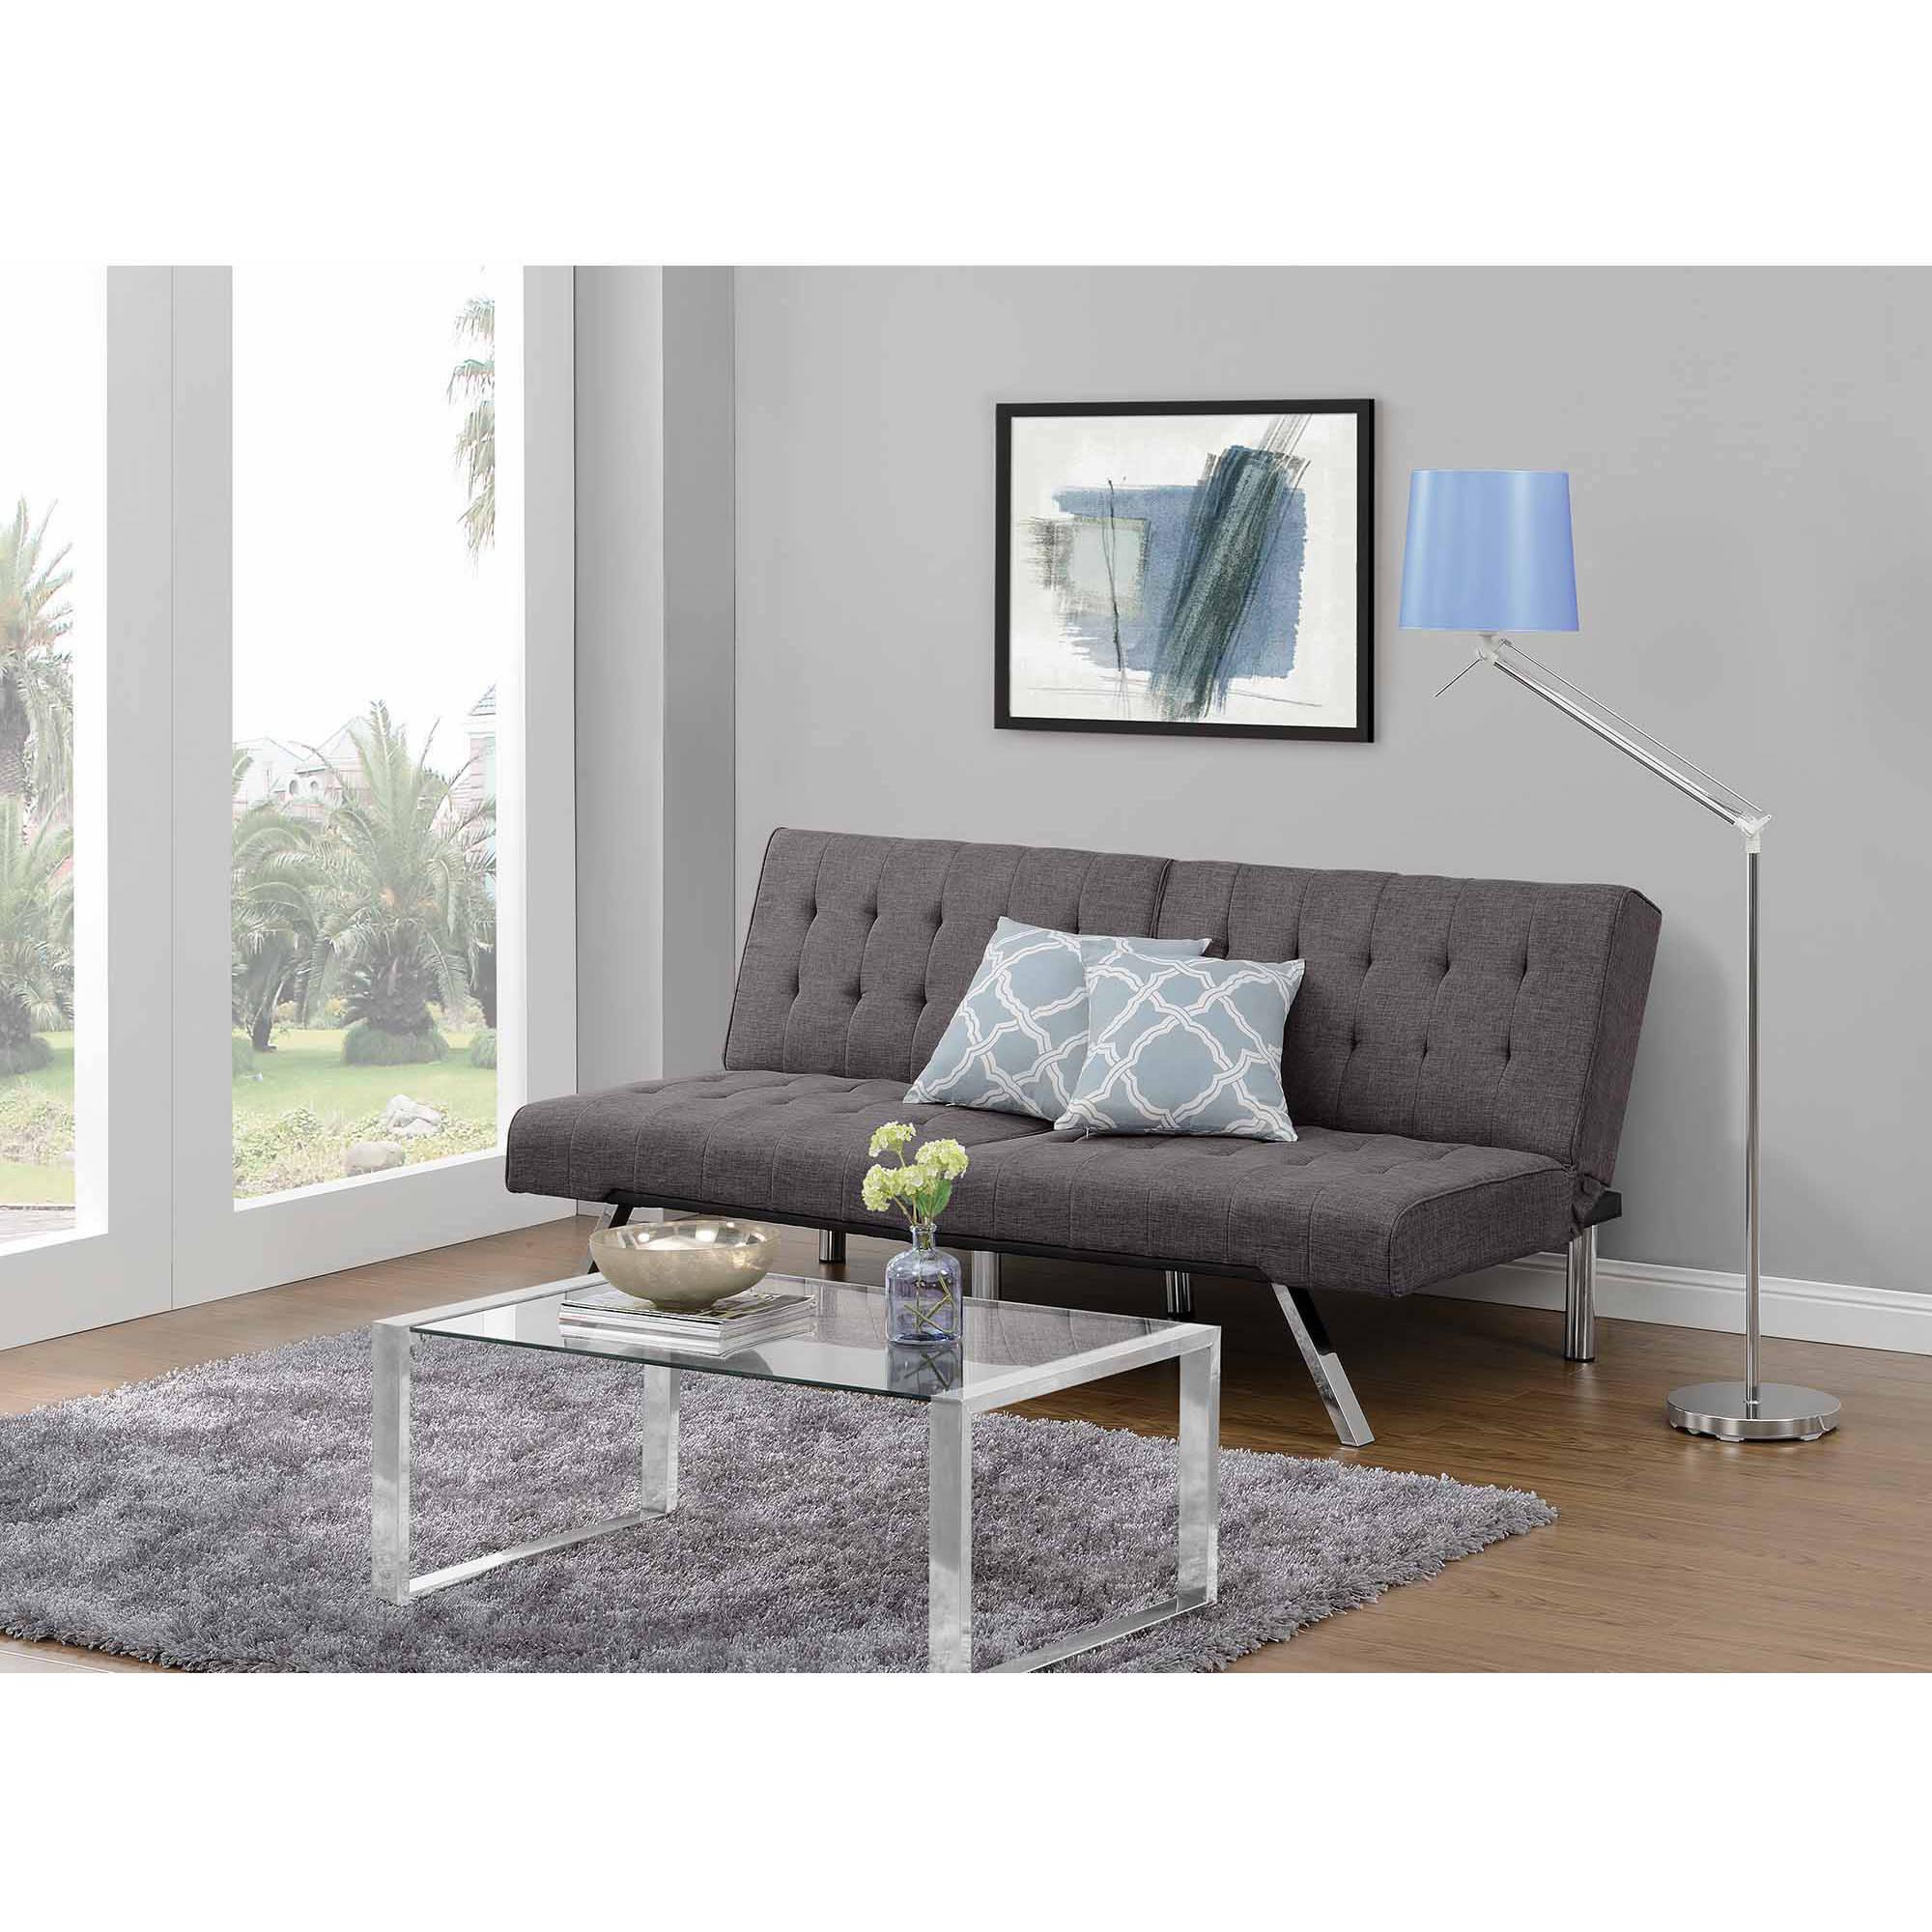 futon beds $150-$250 NECTJXK